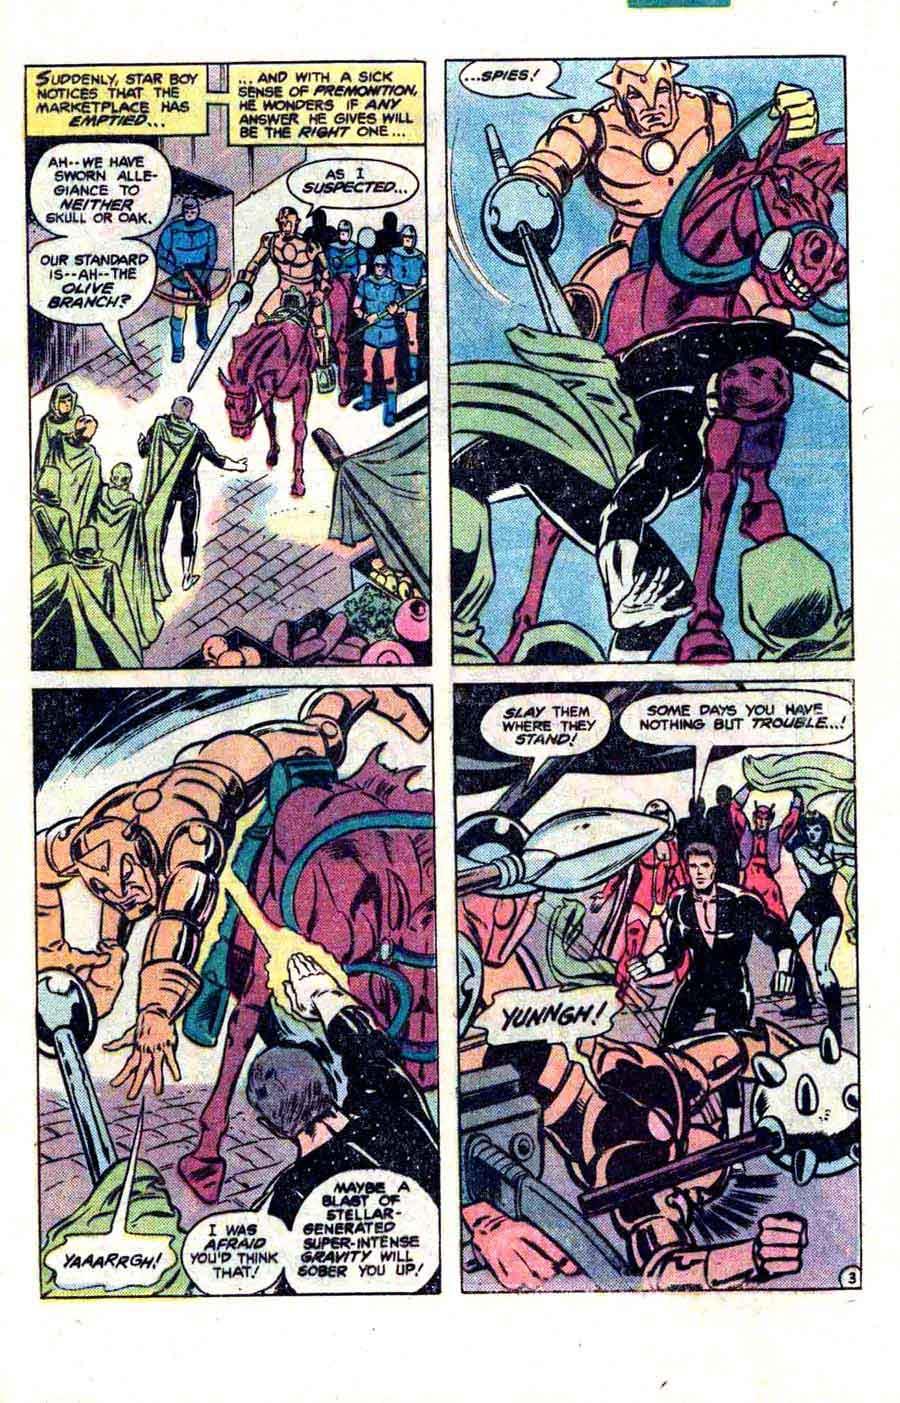 Legion of Super-Heroes v2 #276 - Steve Ditko dc 1980s comic book page art